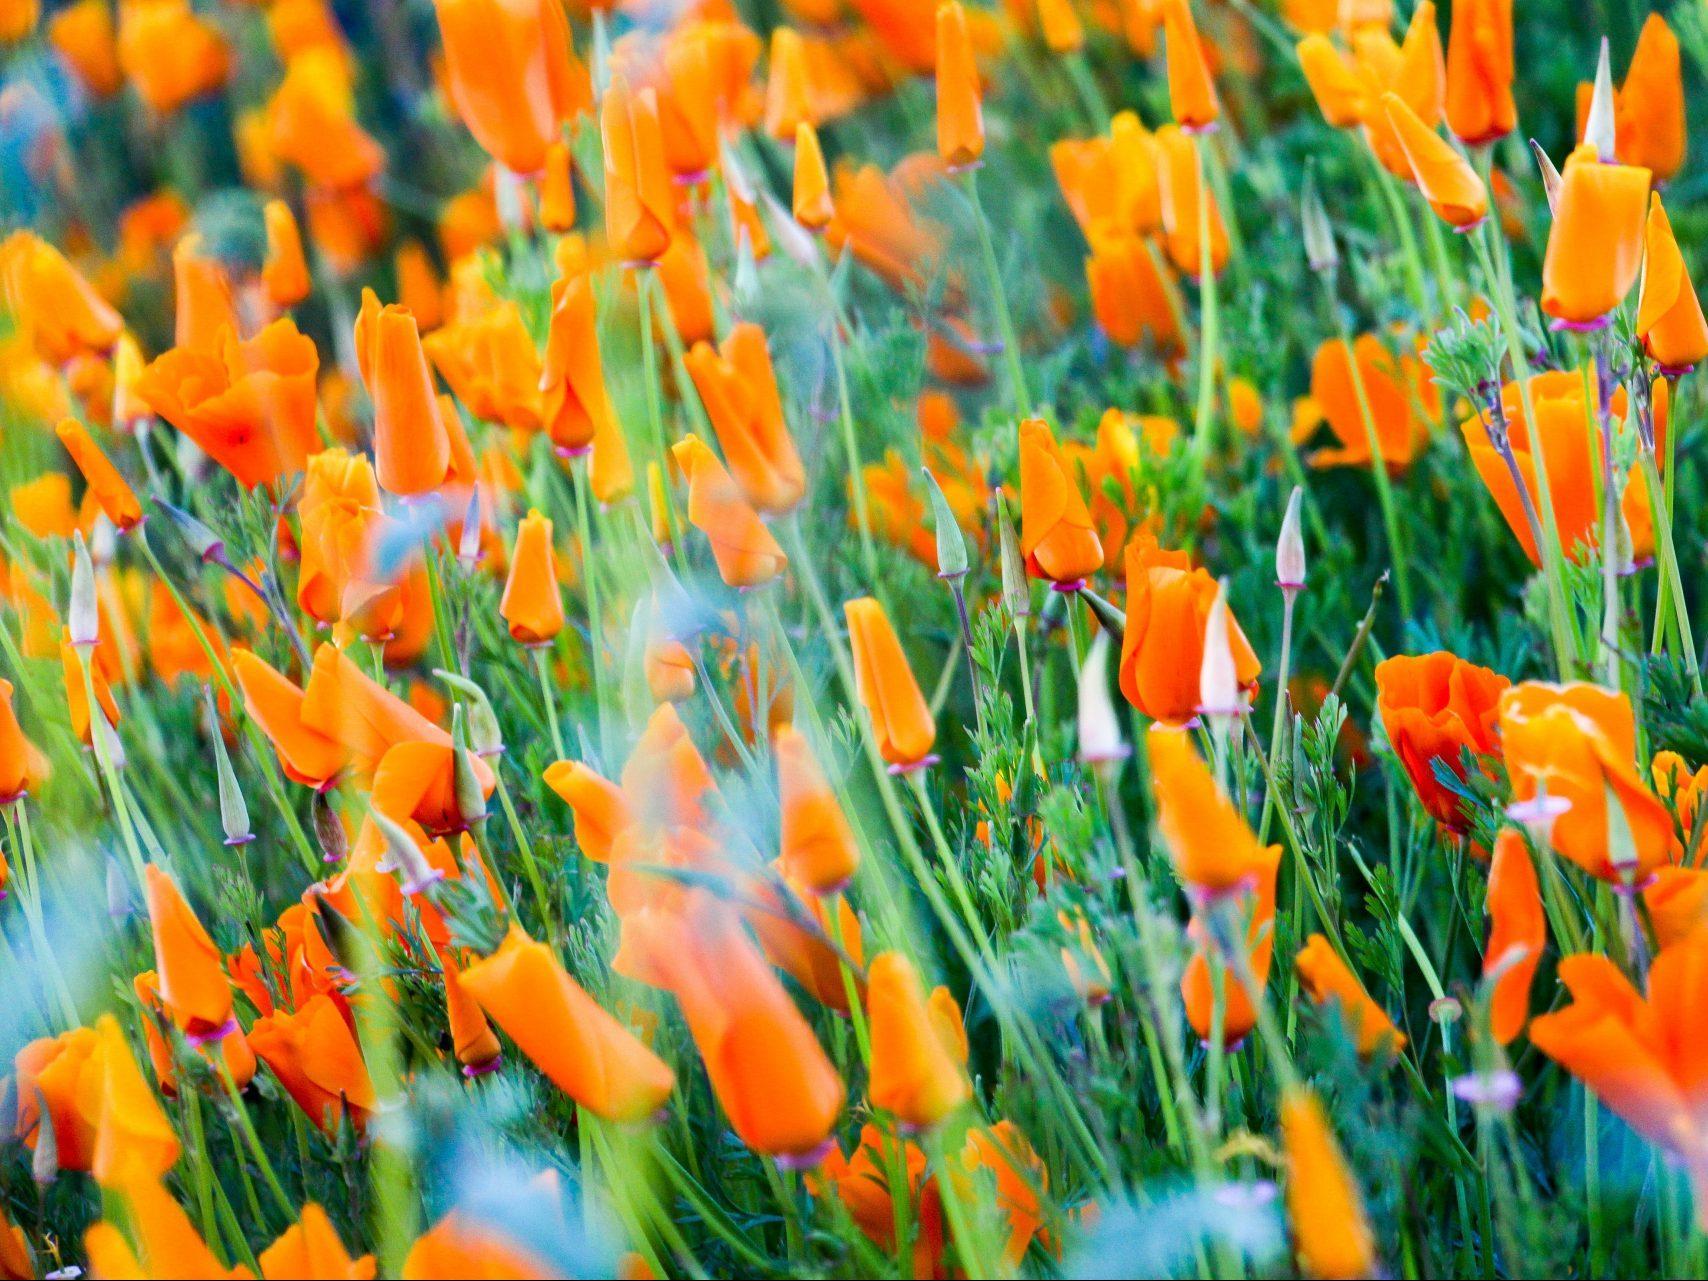 Celebrating California Poppy Day